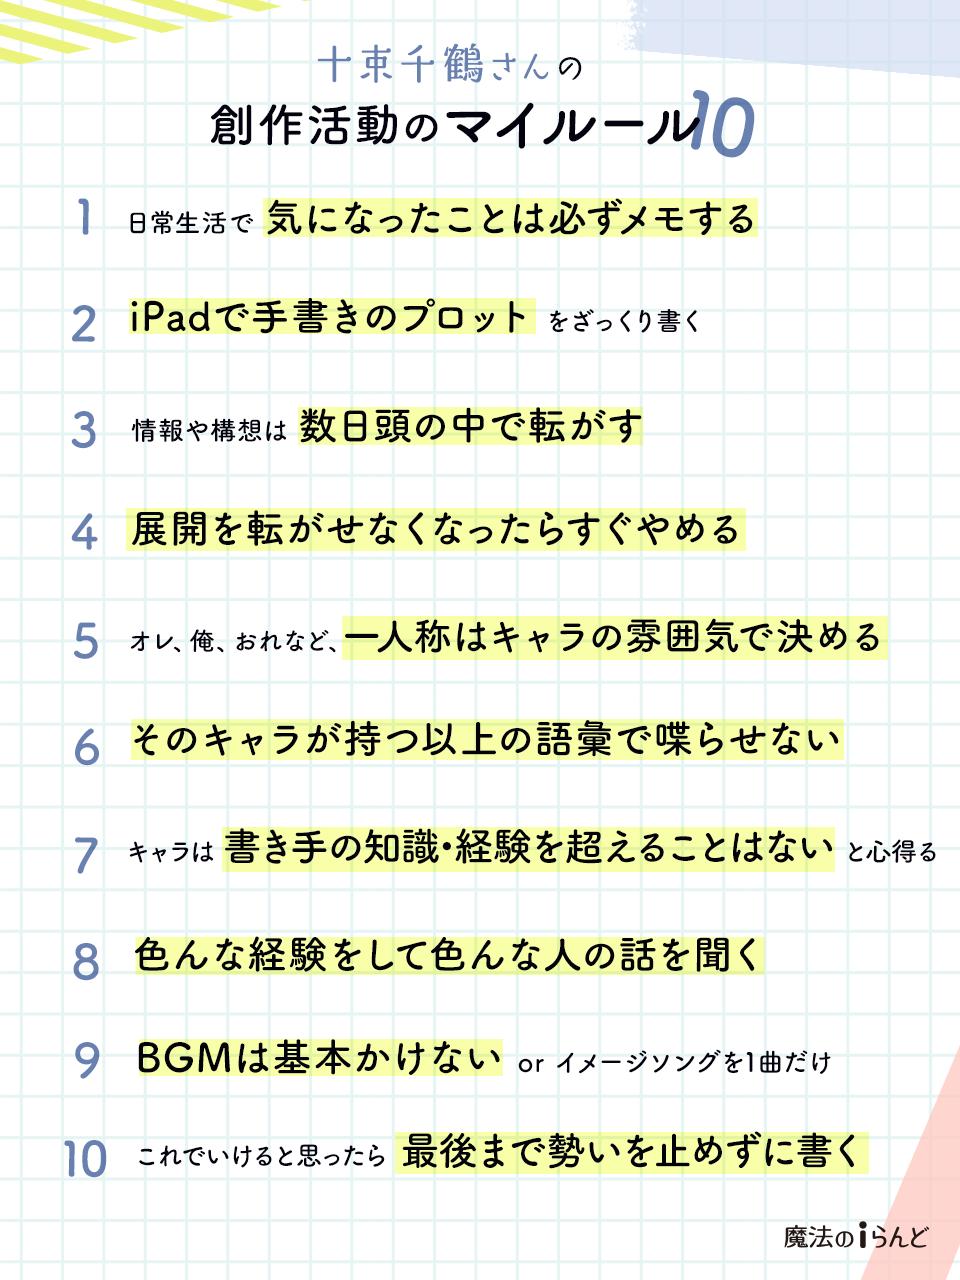 https://storage.googleapis.com/blog-info/entry/2021/09/08-myrule-totsuka_twitter.png